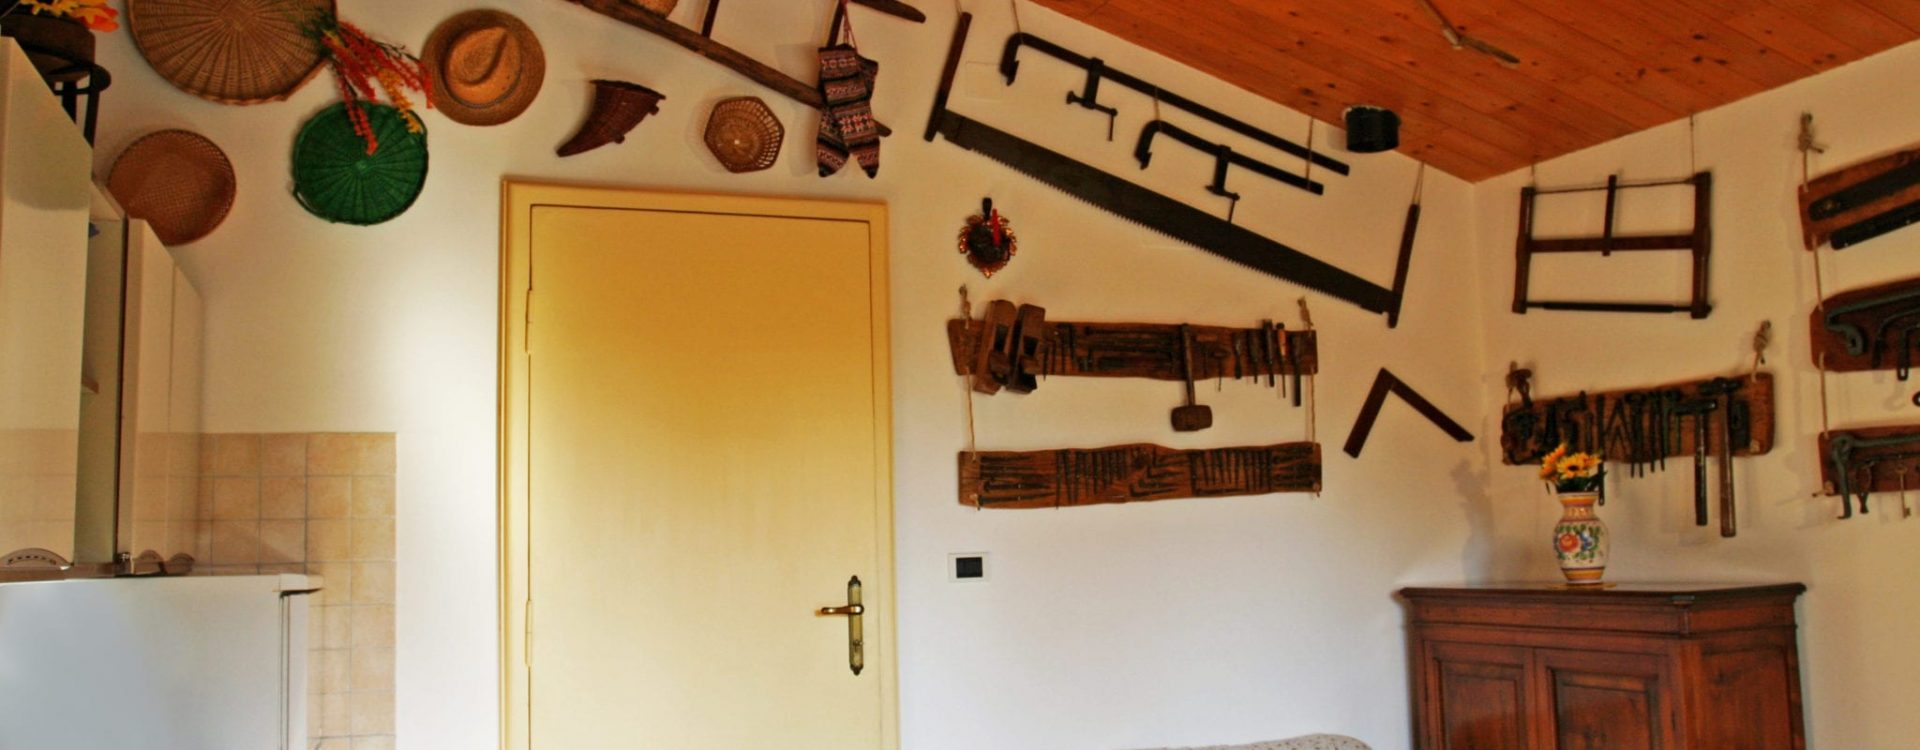 2 - cucina-porta